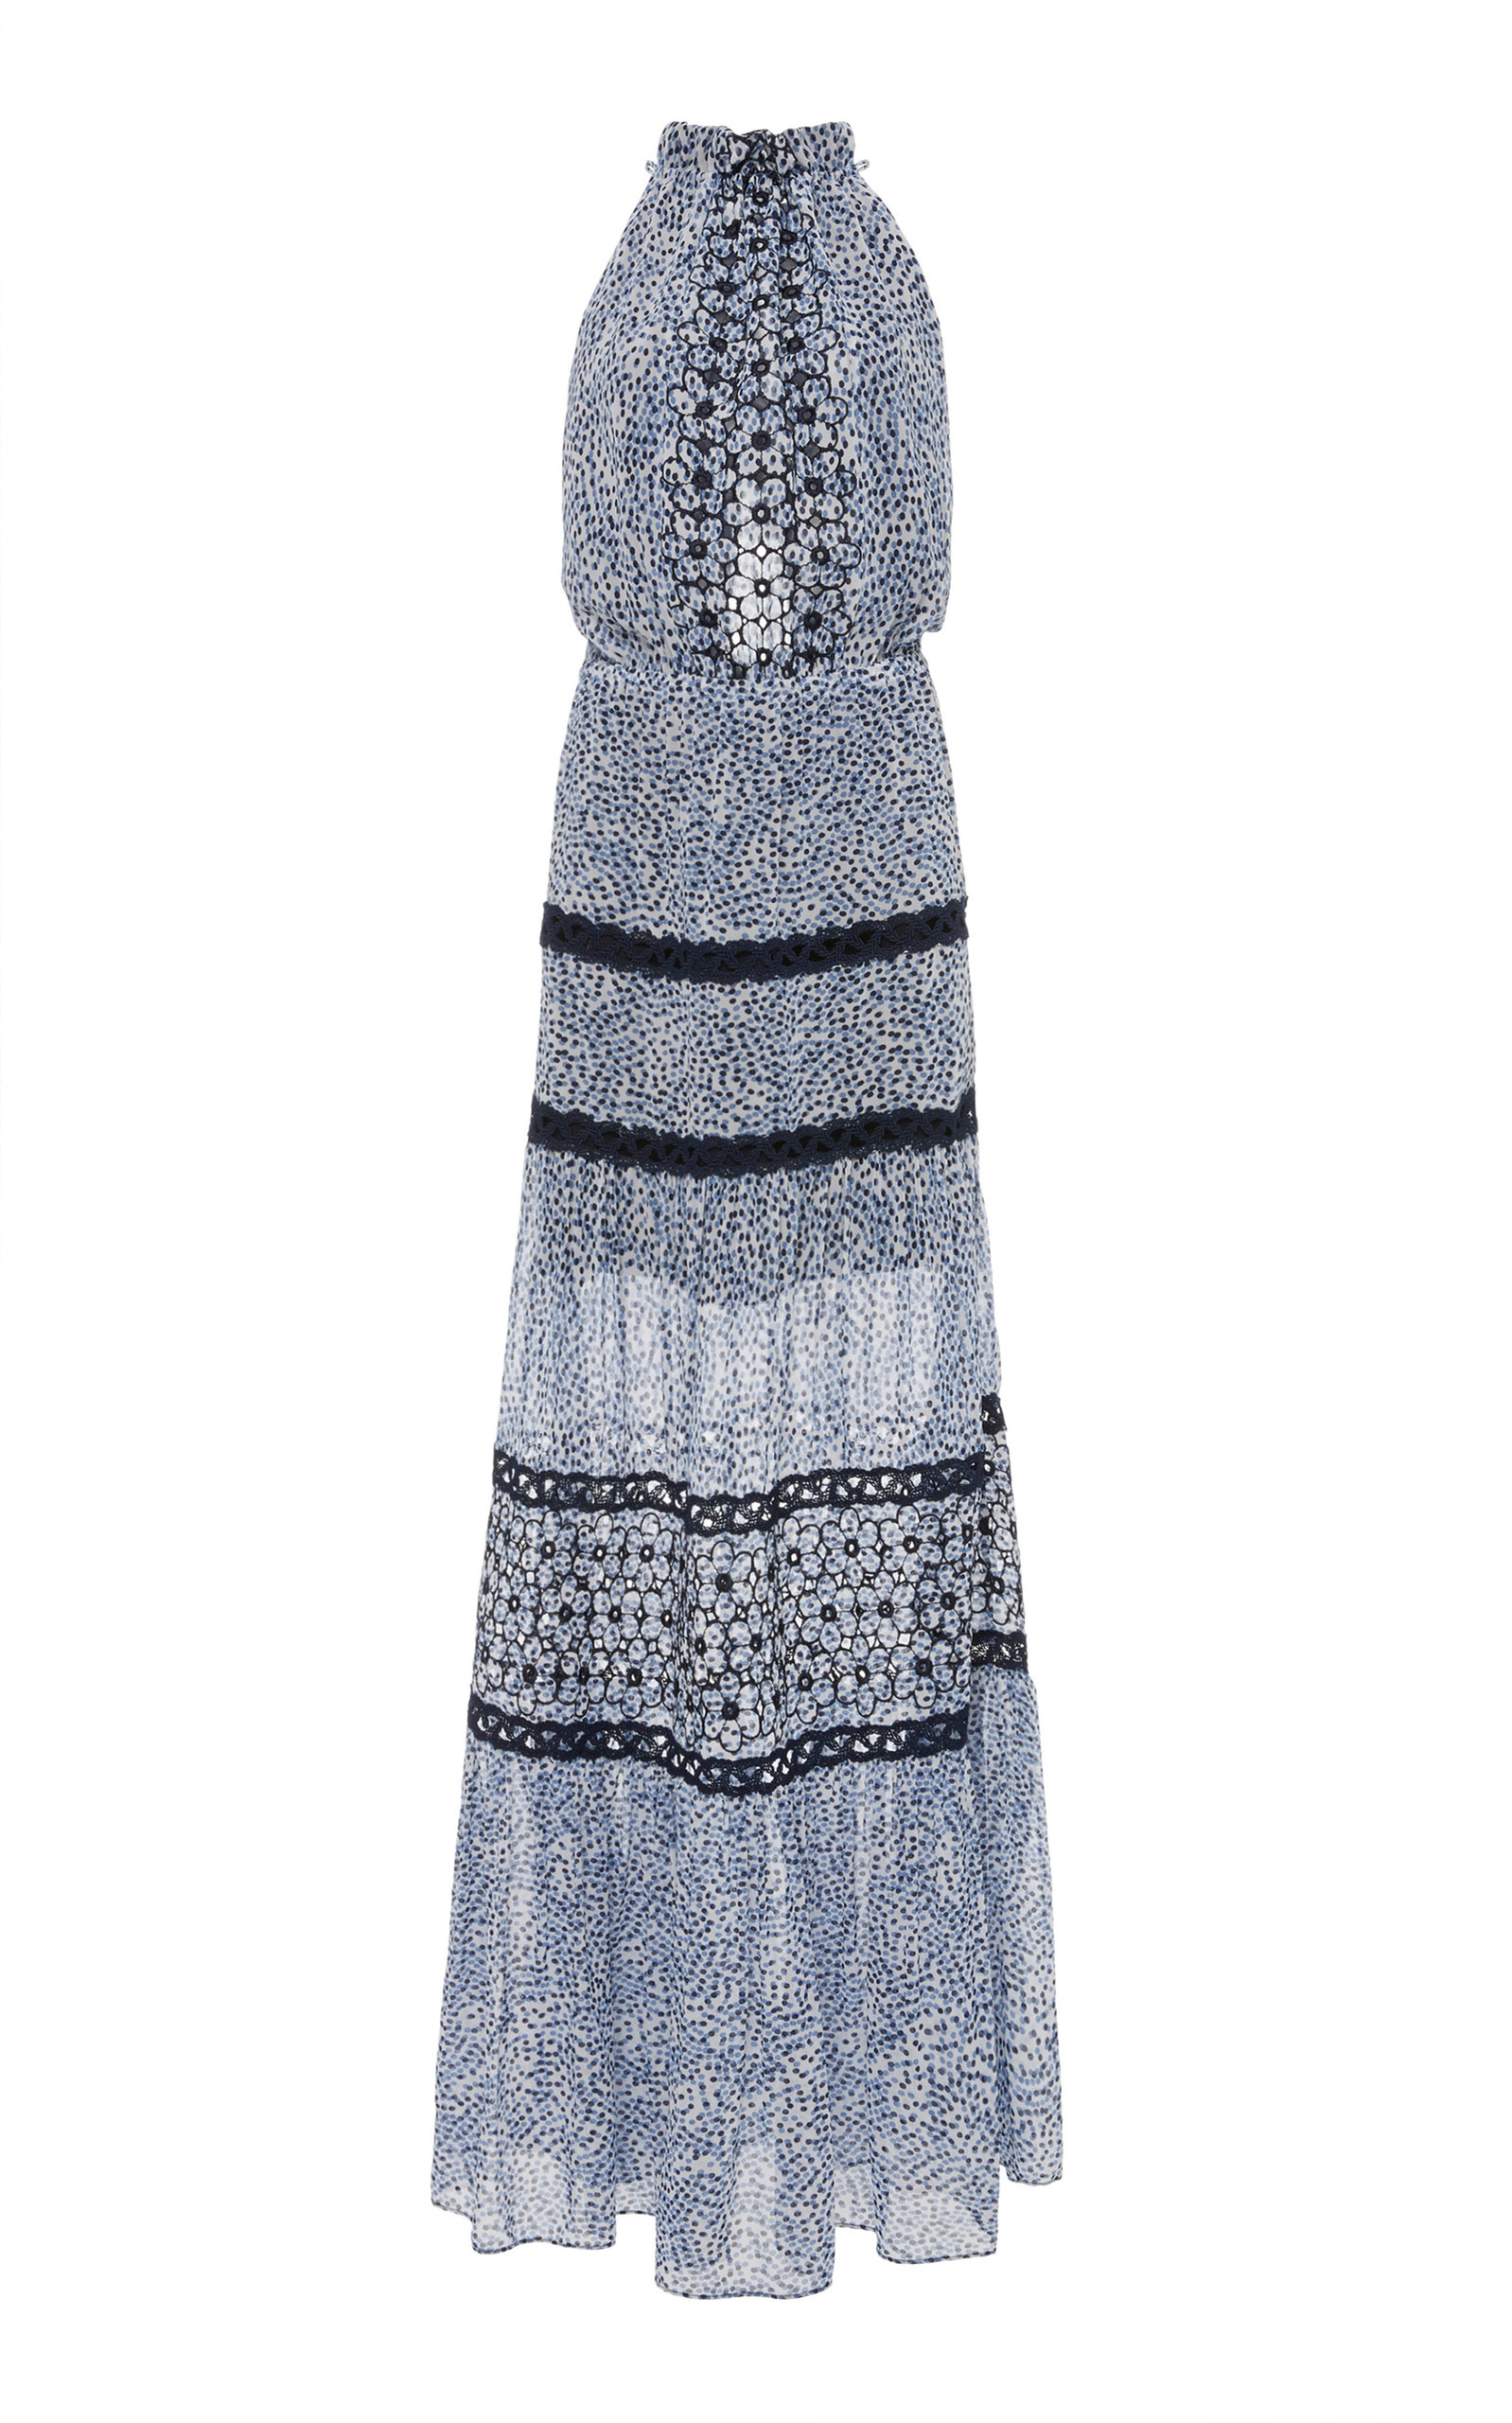 Bel Printed Crochet Maxi Dress in Blue